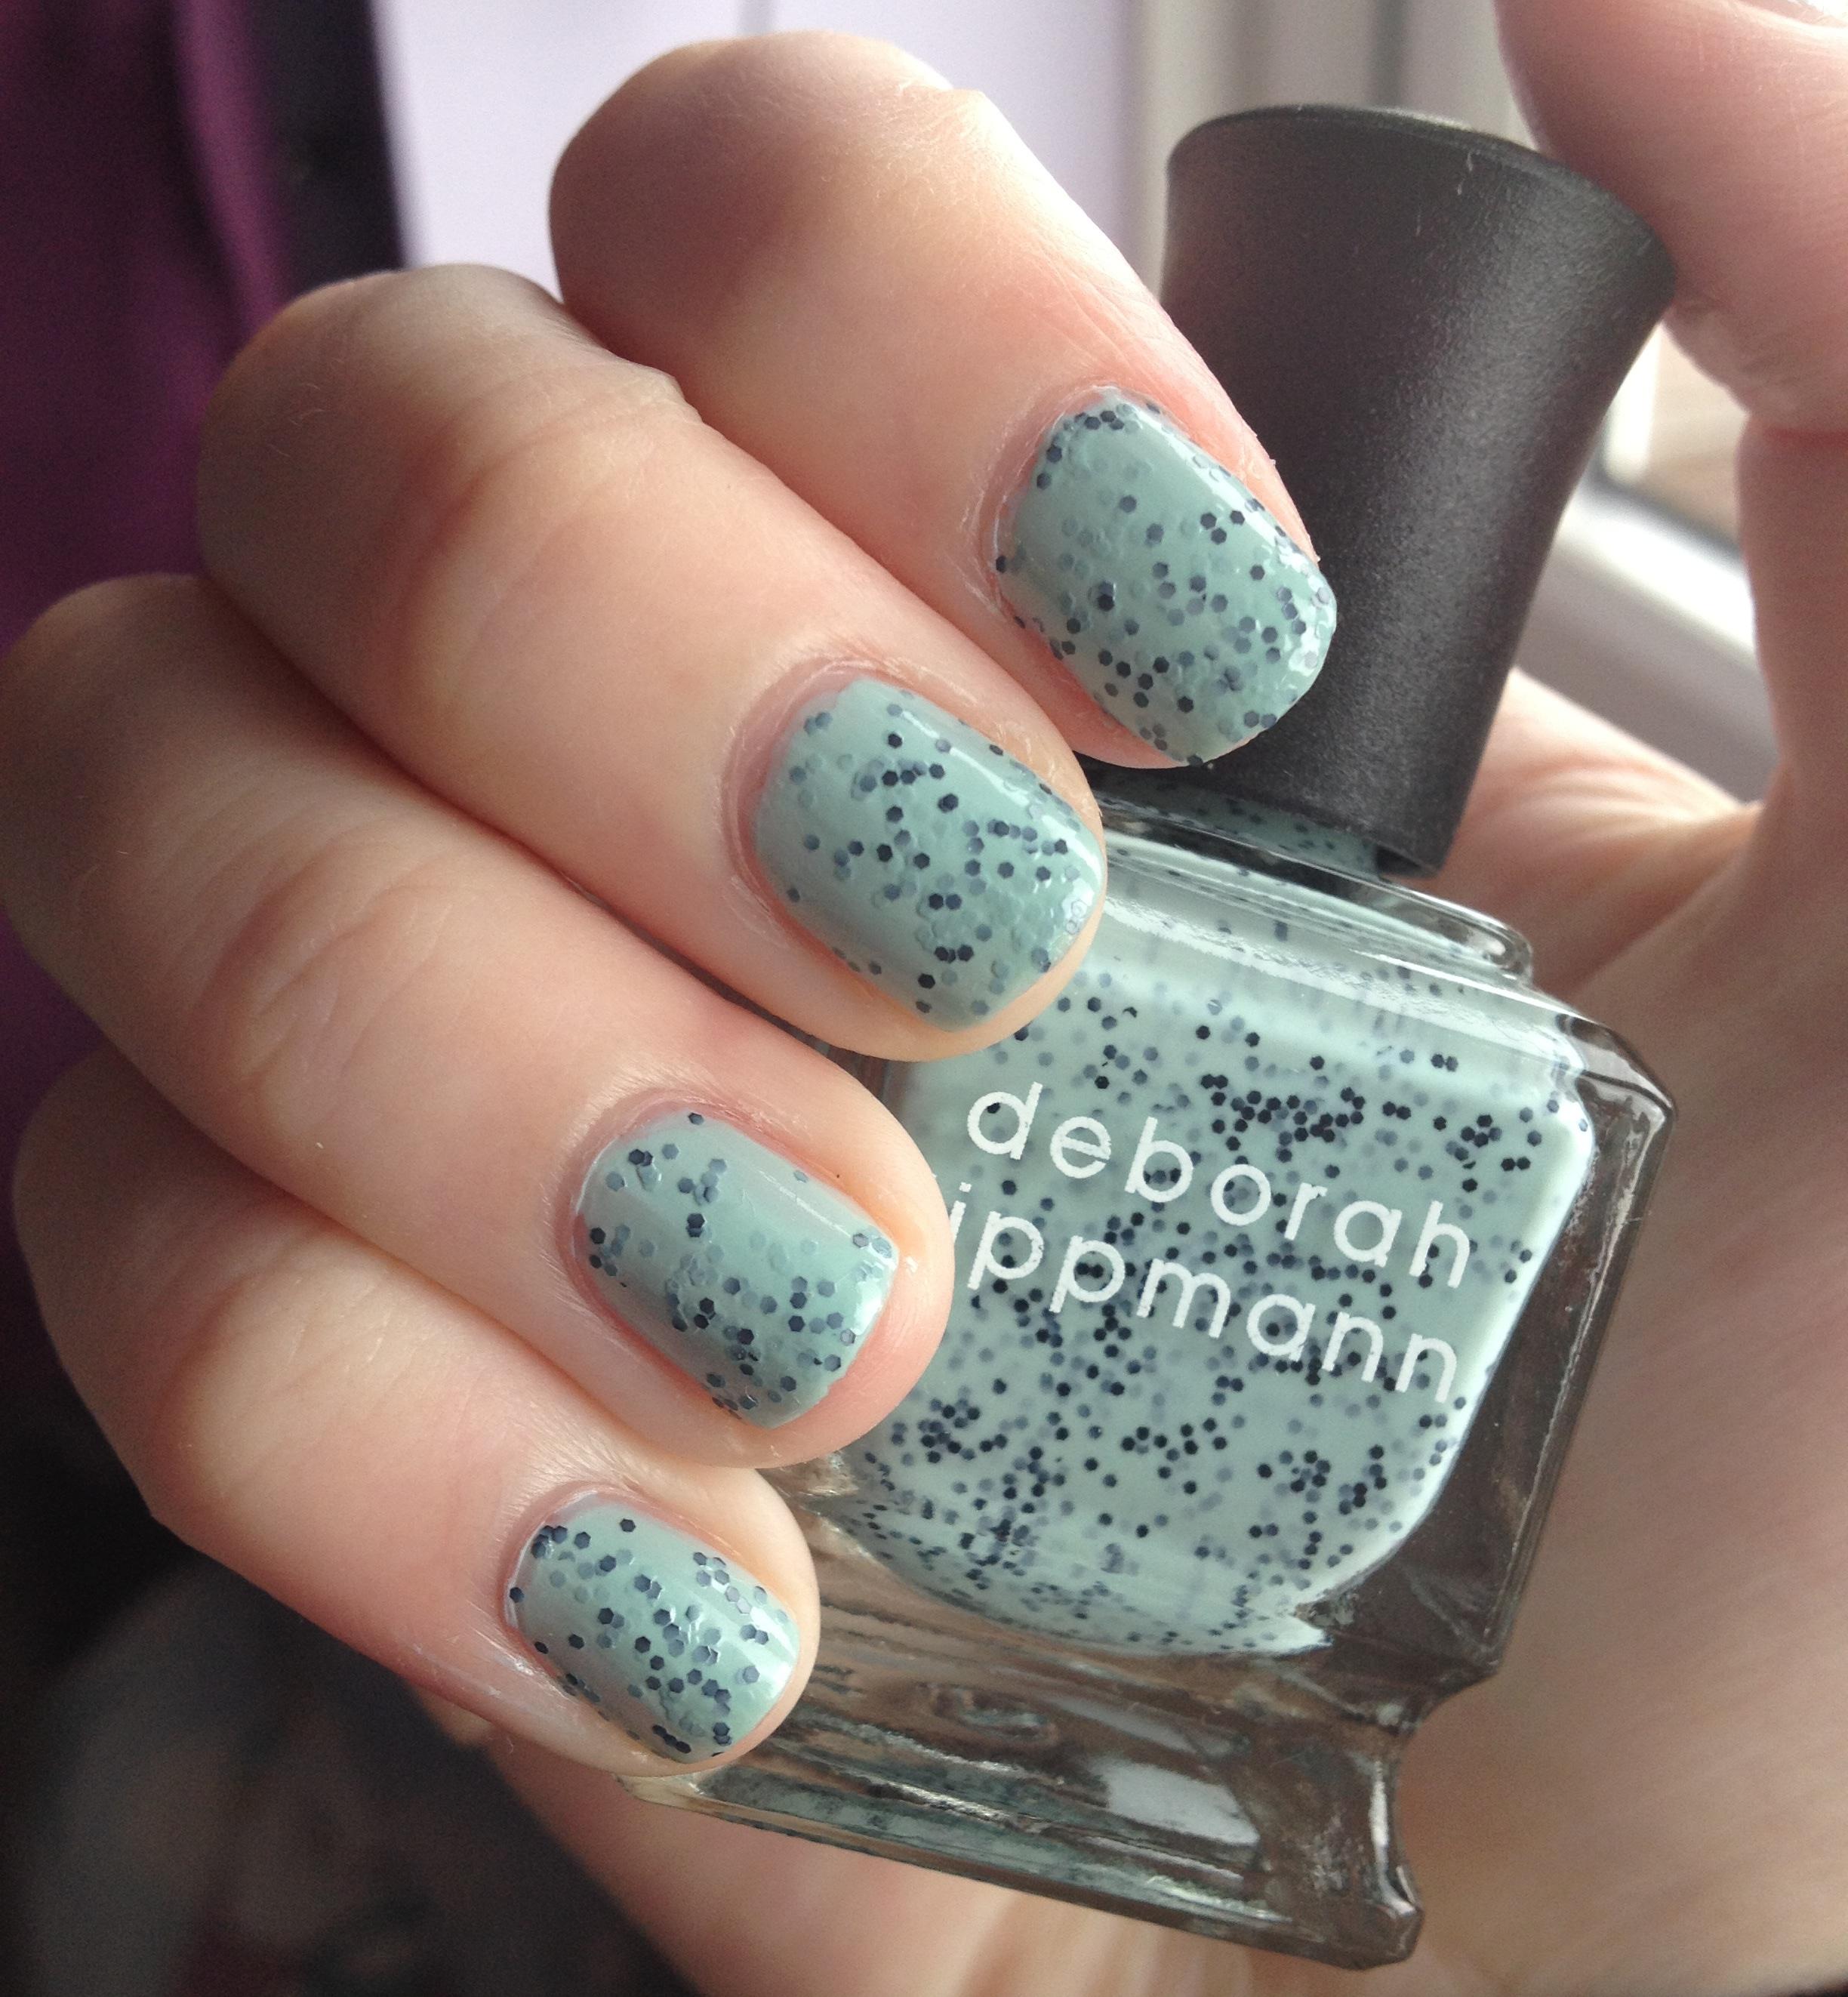 Deborah Lippmann Rockin\' Robin nail polish review | Through The ...